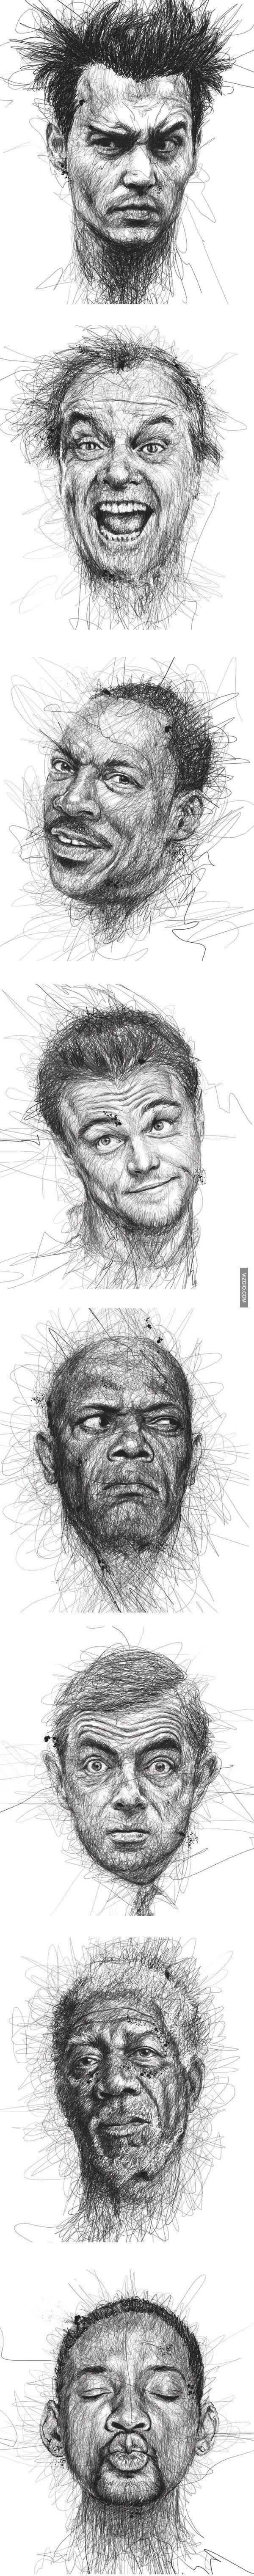 8 Dibujos de rostros asombrosos por Vince baja. @ http://elmemeno.com/